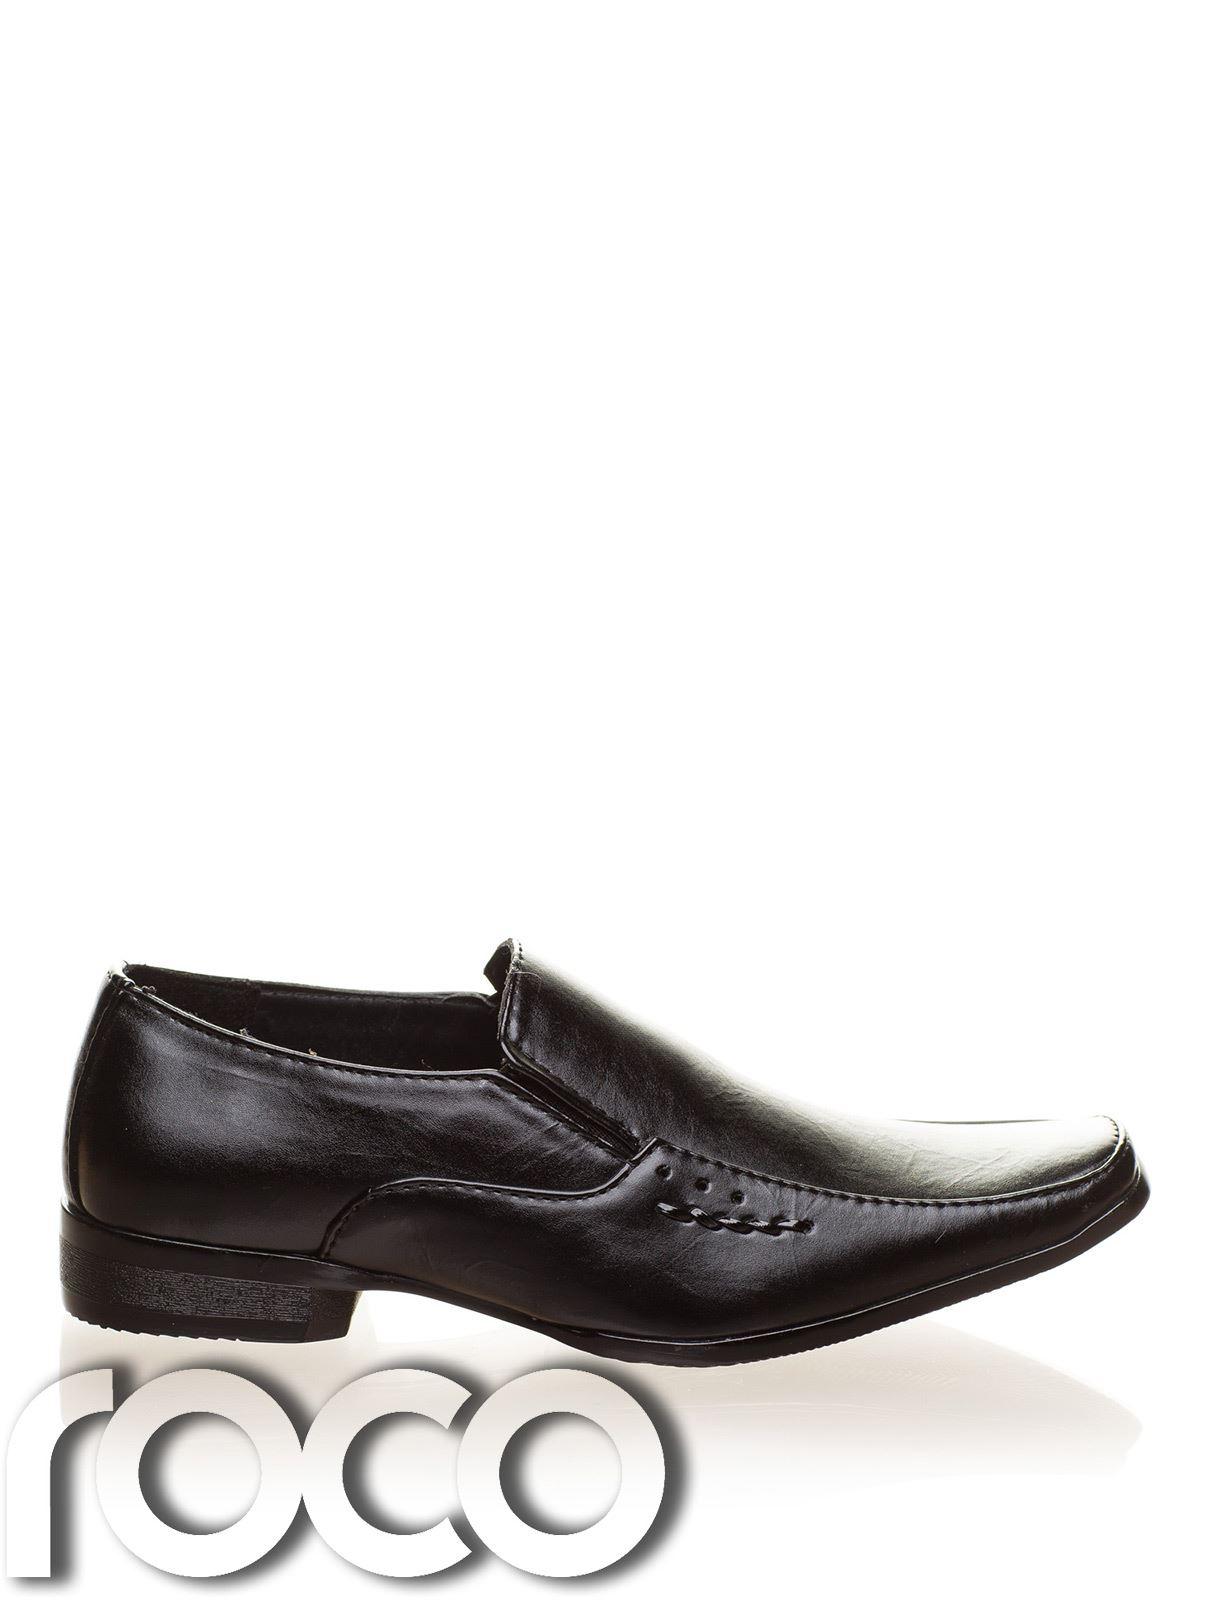 boys black shoes boys brown shoes slip on shoes boys